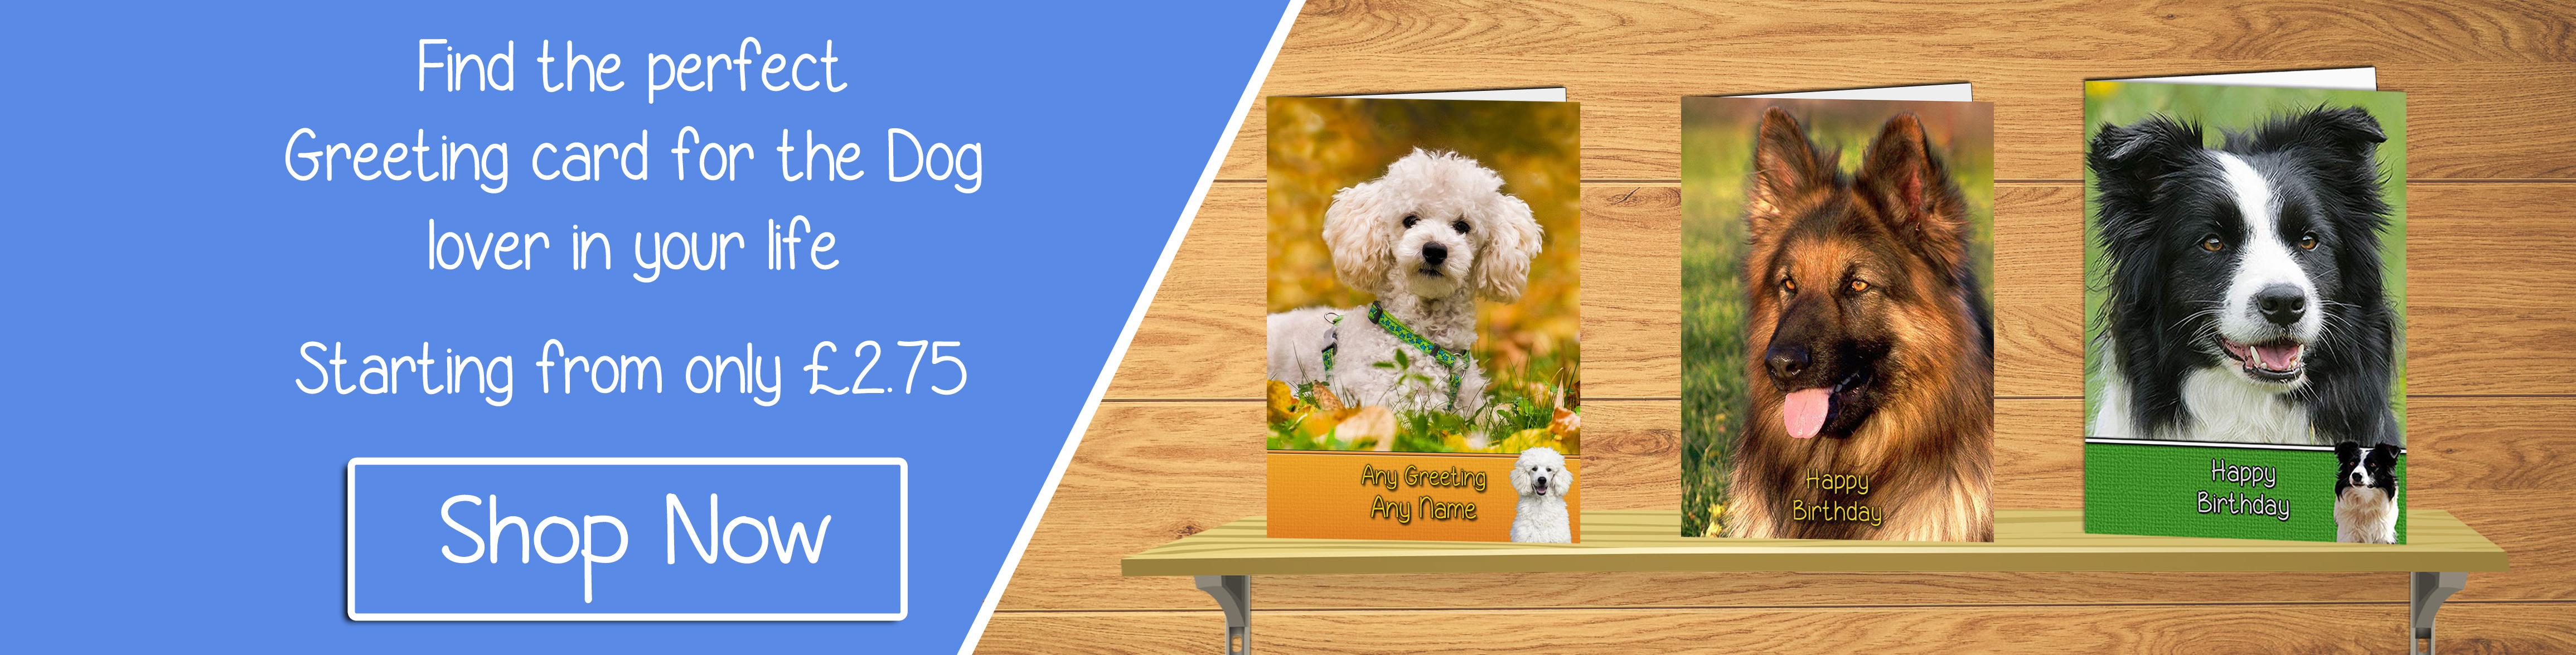 Dog Greeting Cards